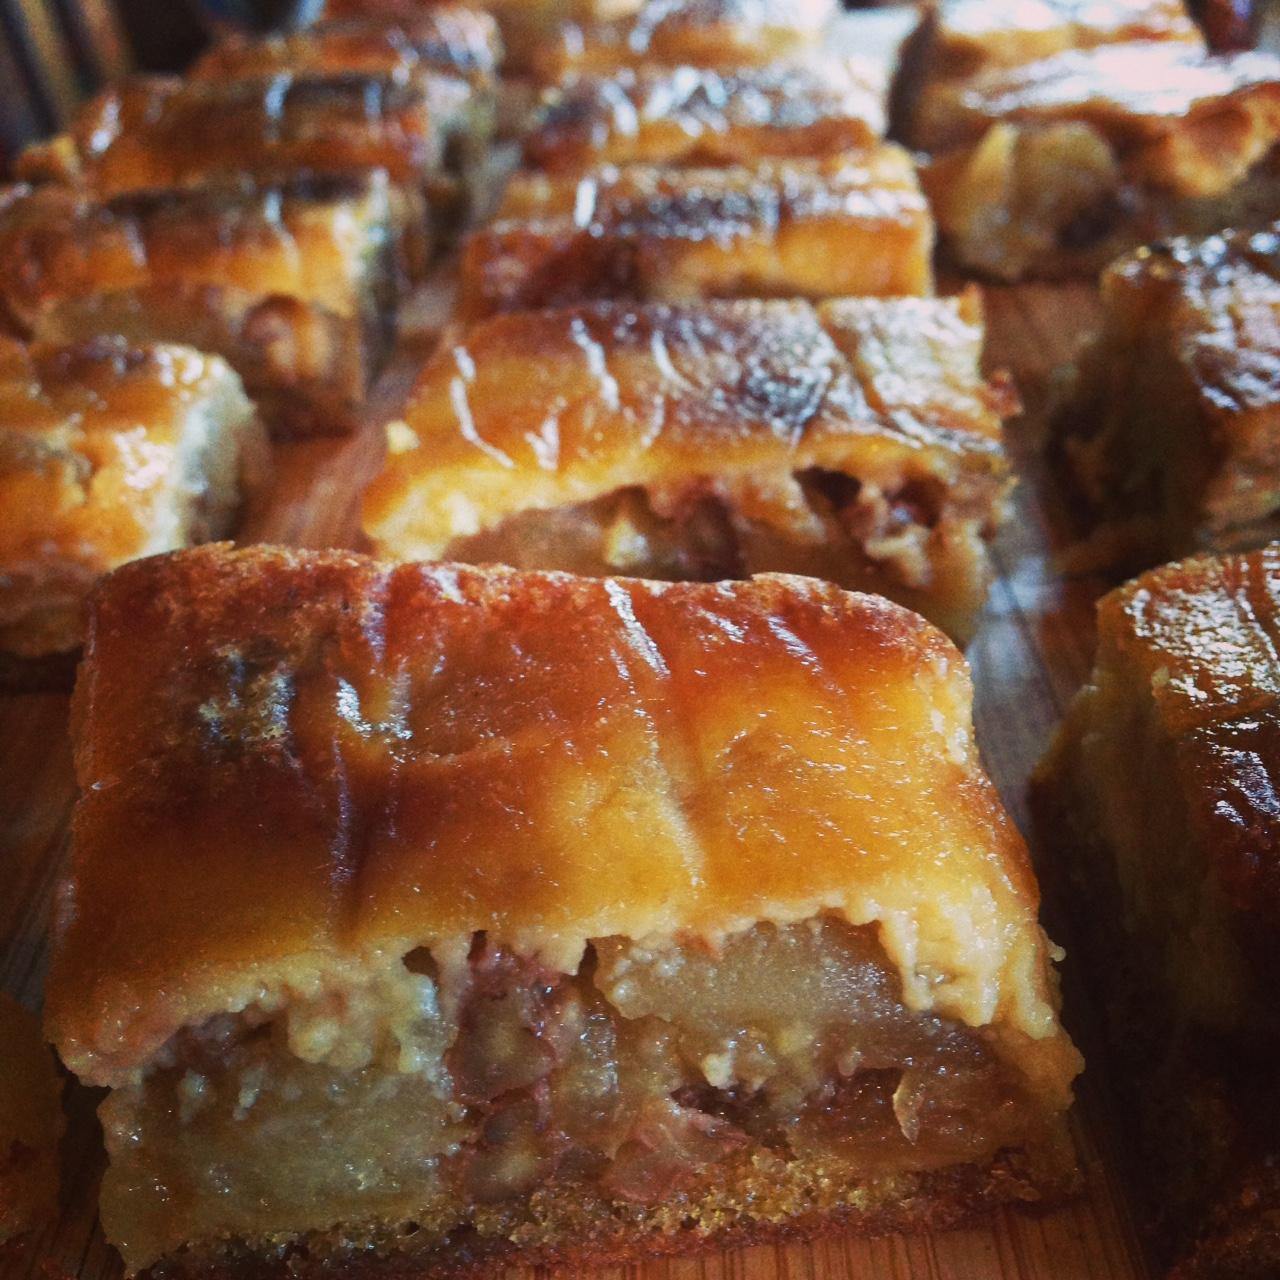 Apple, Pecan and Custard cake